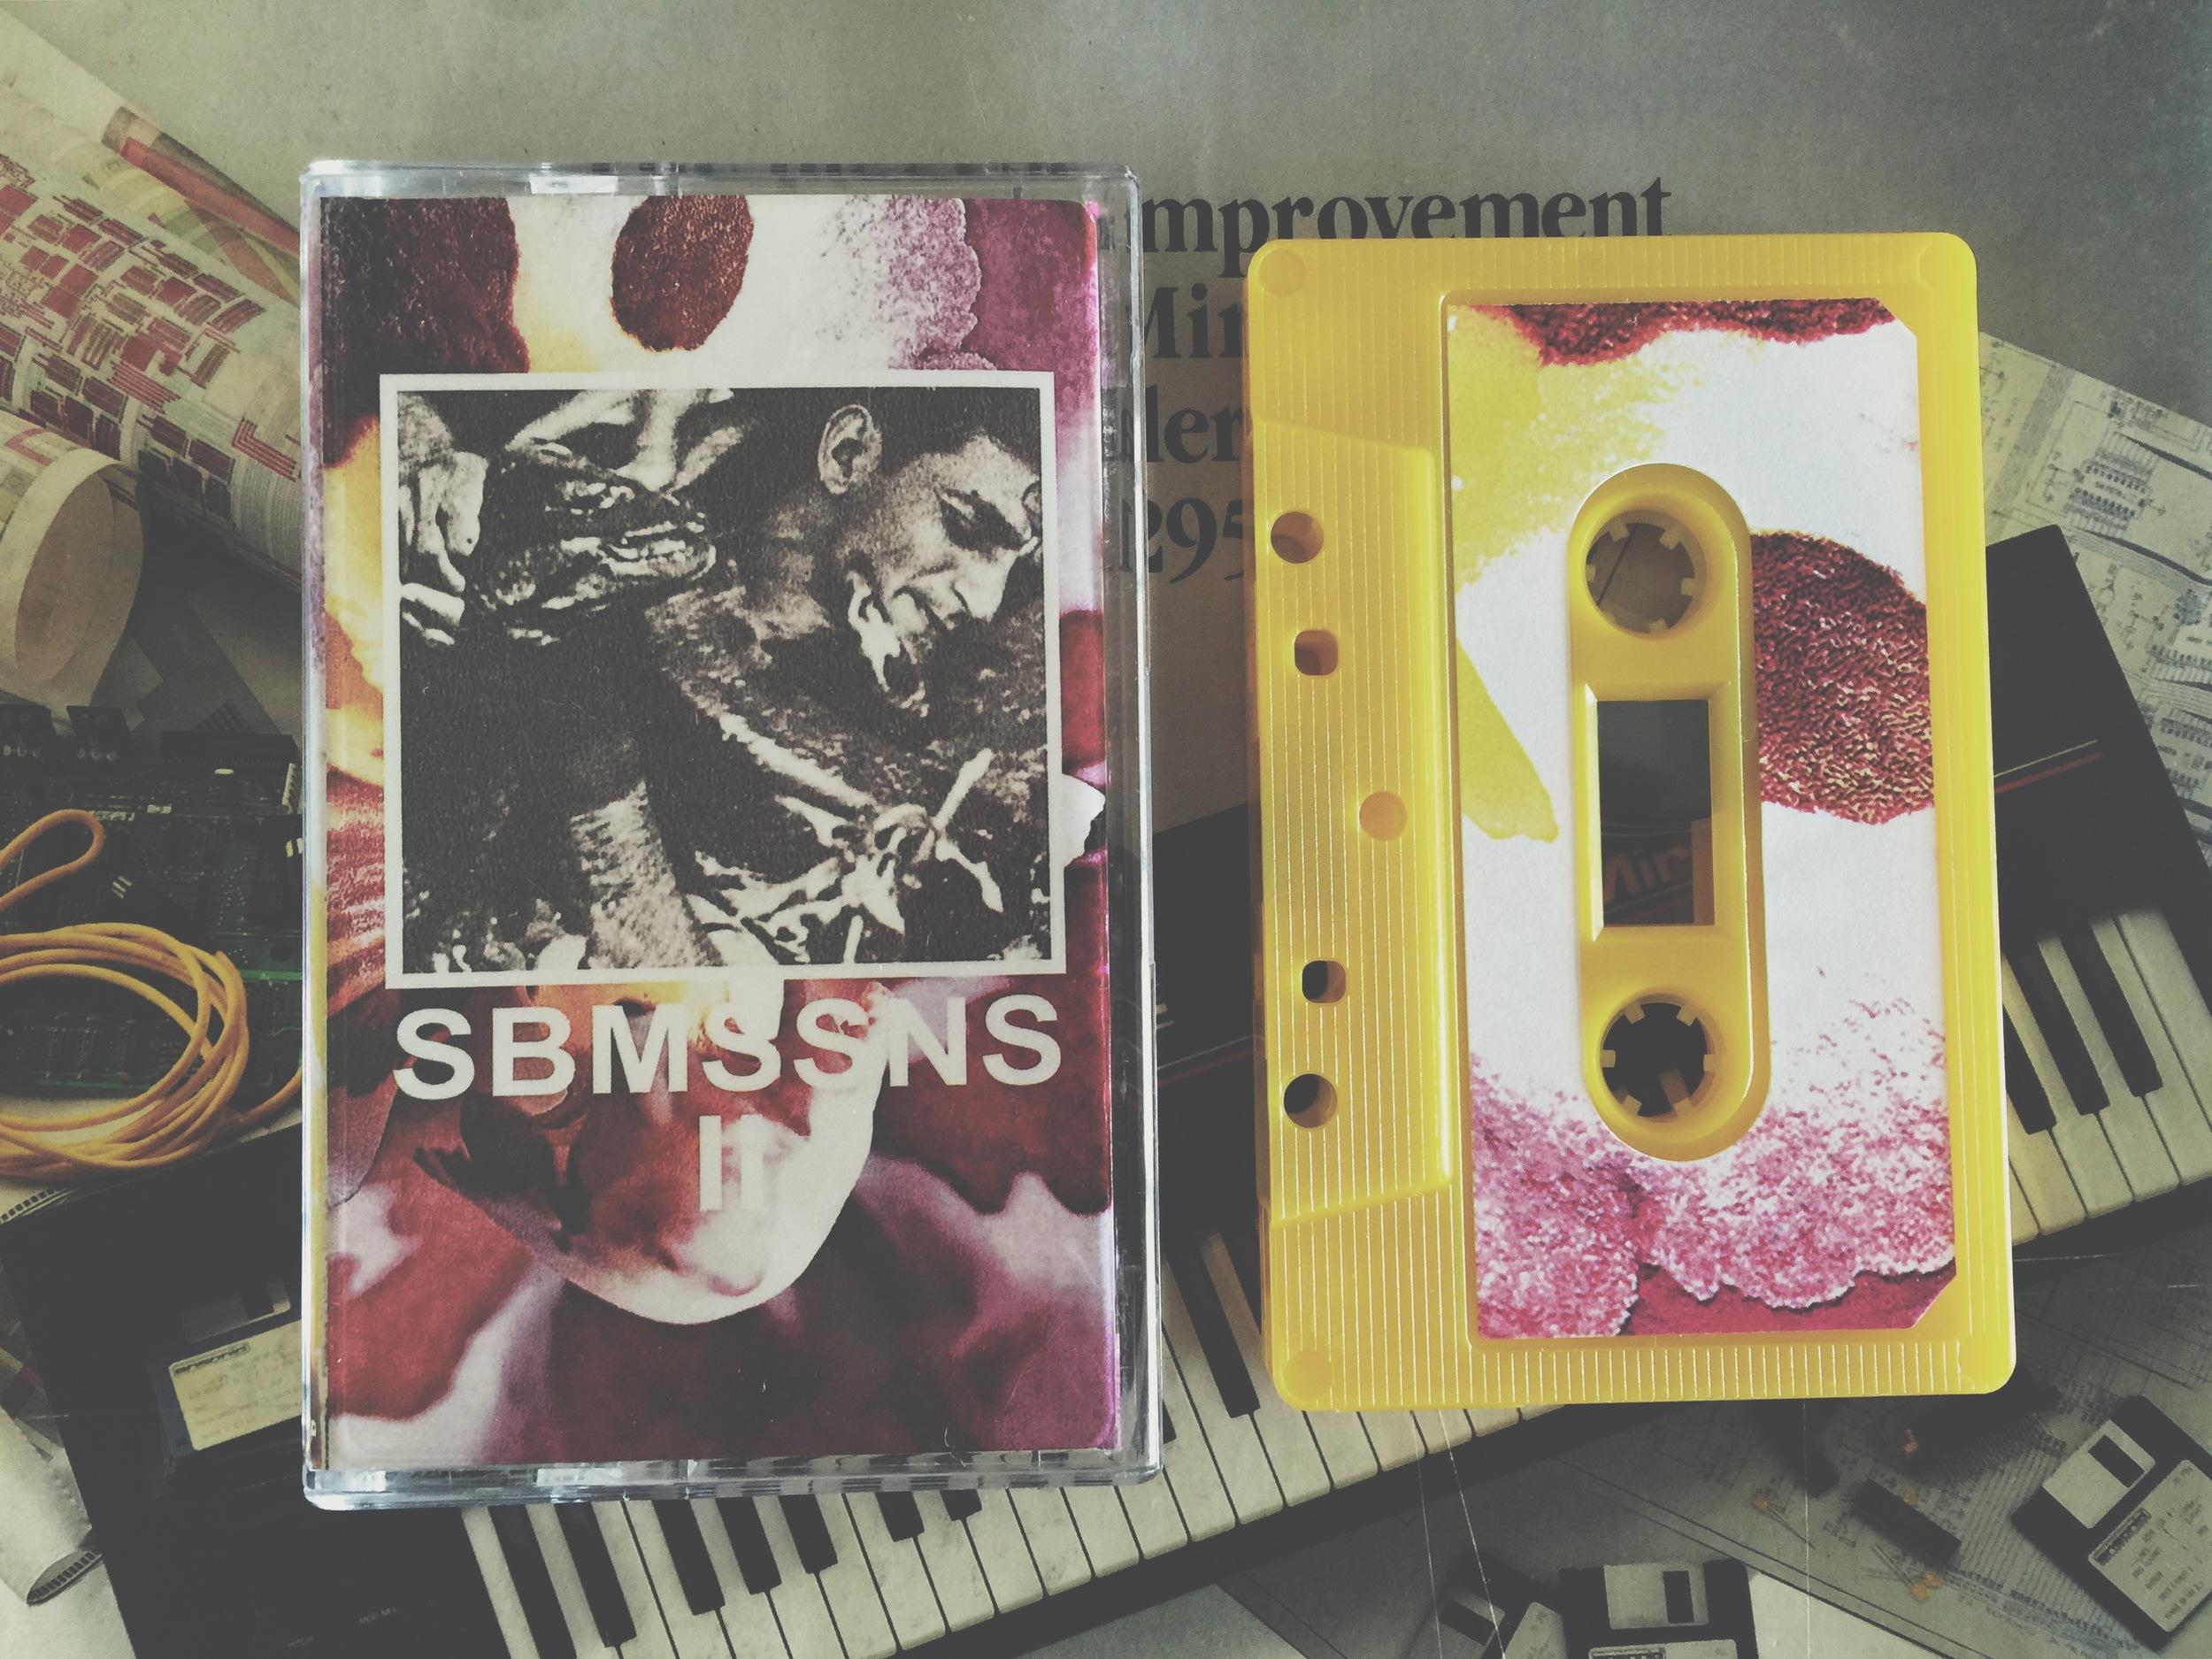 01. SBMSSNS - II.jpg